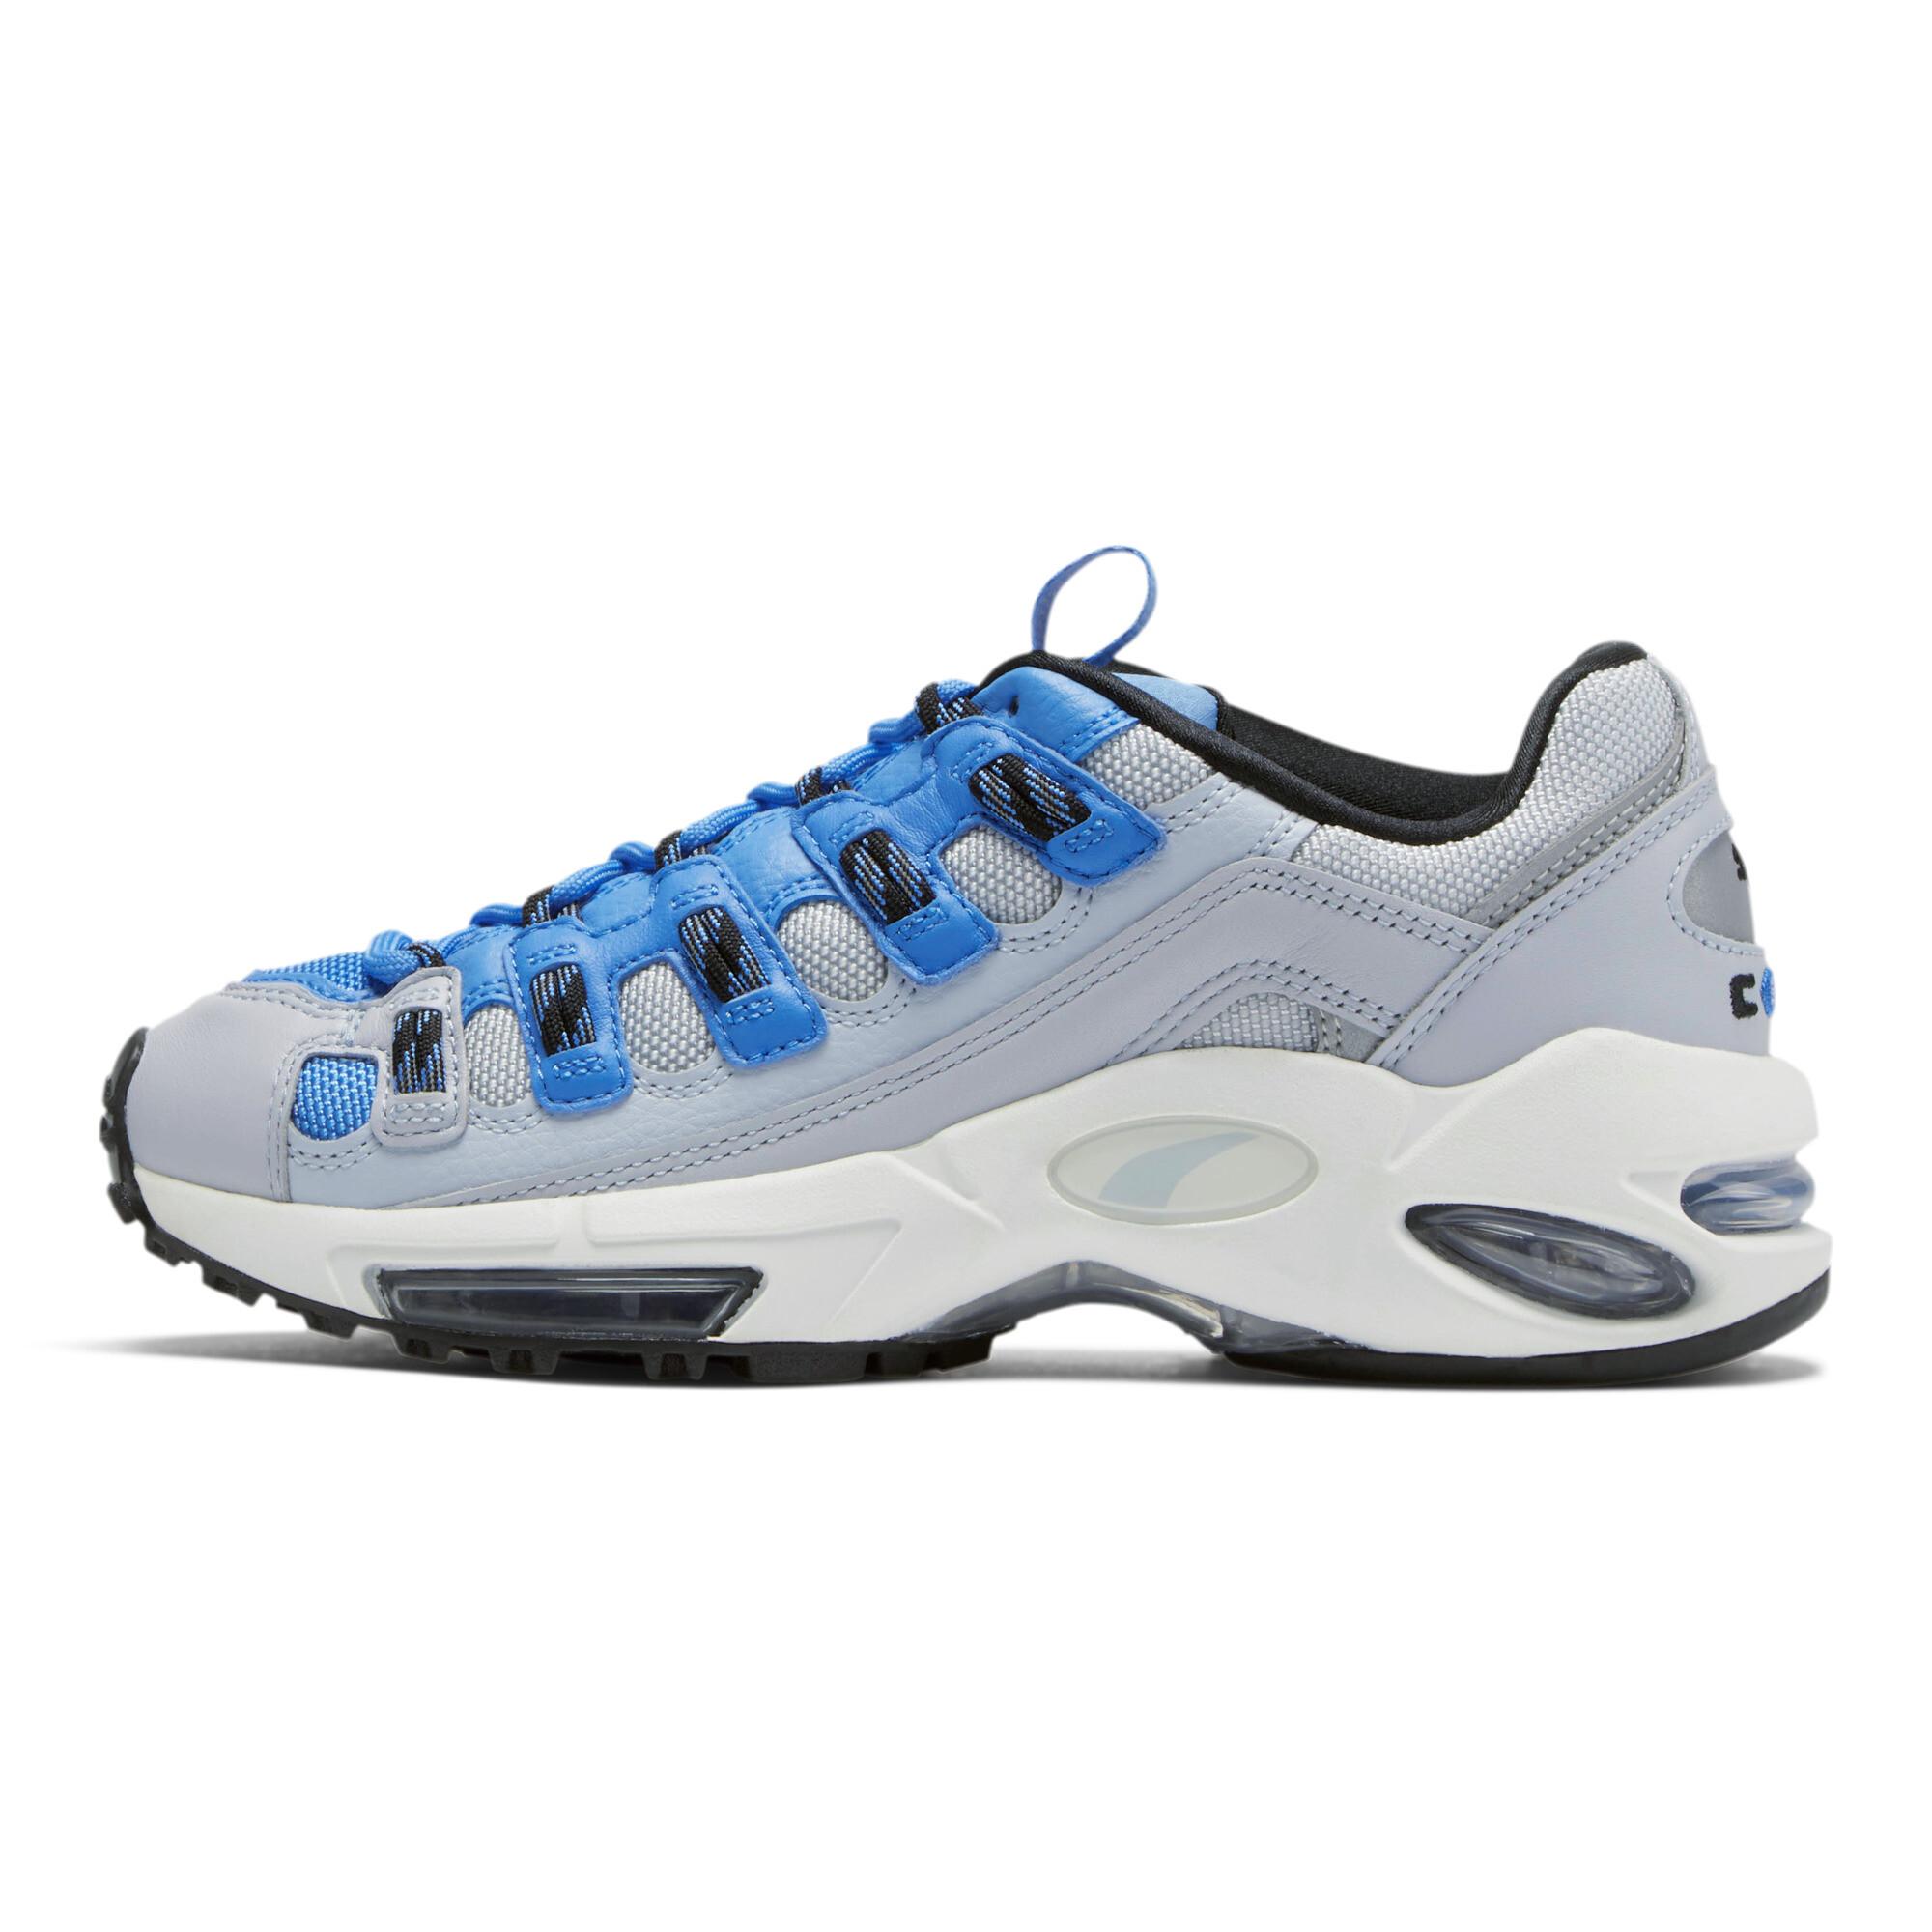 PUMA-CELL-Endura-Rebound-Women-039-s-Sneakers-Women-Shoe-Sport-Classics thumbnail 4